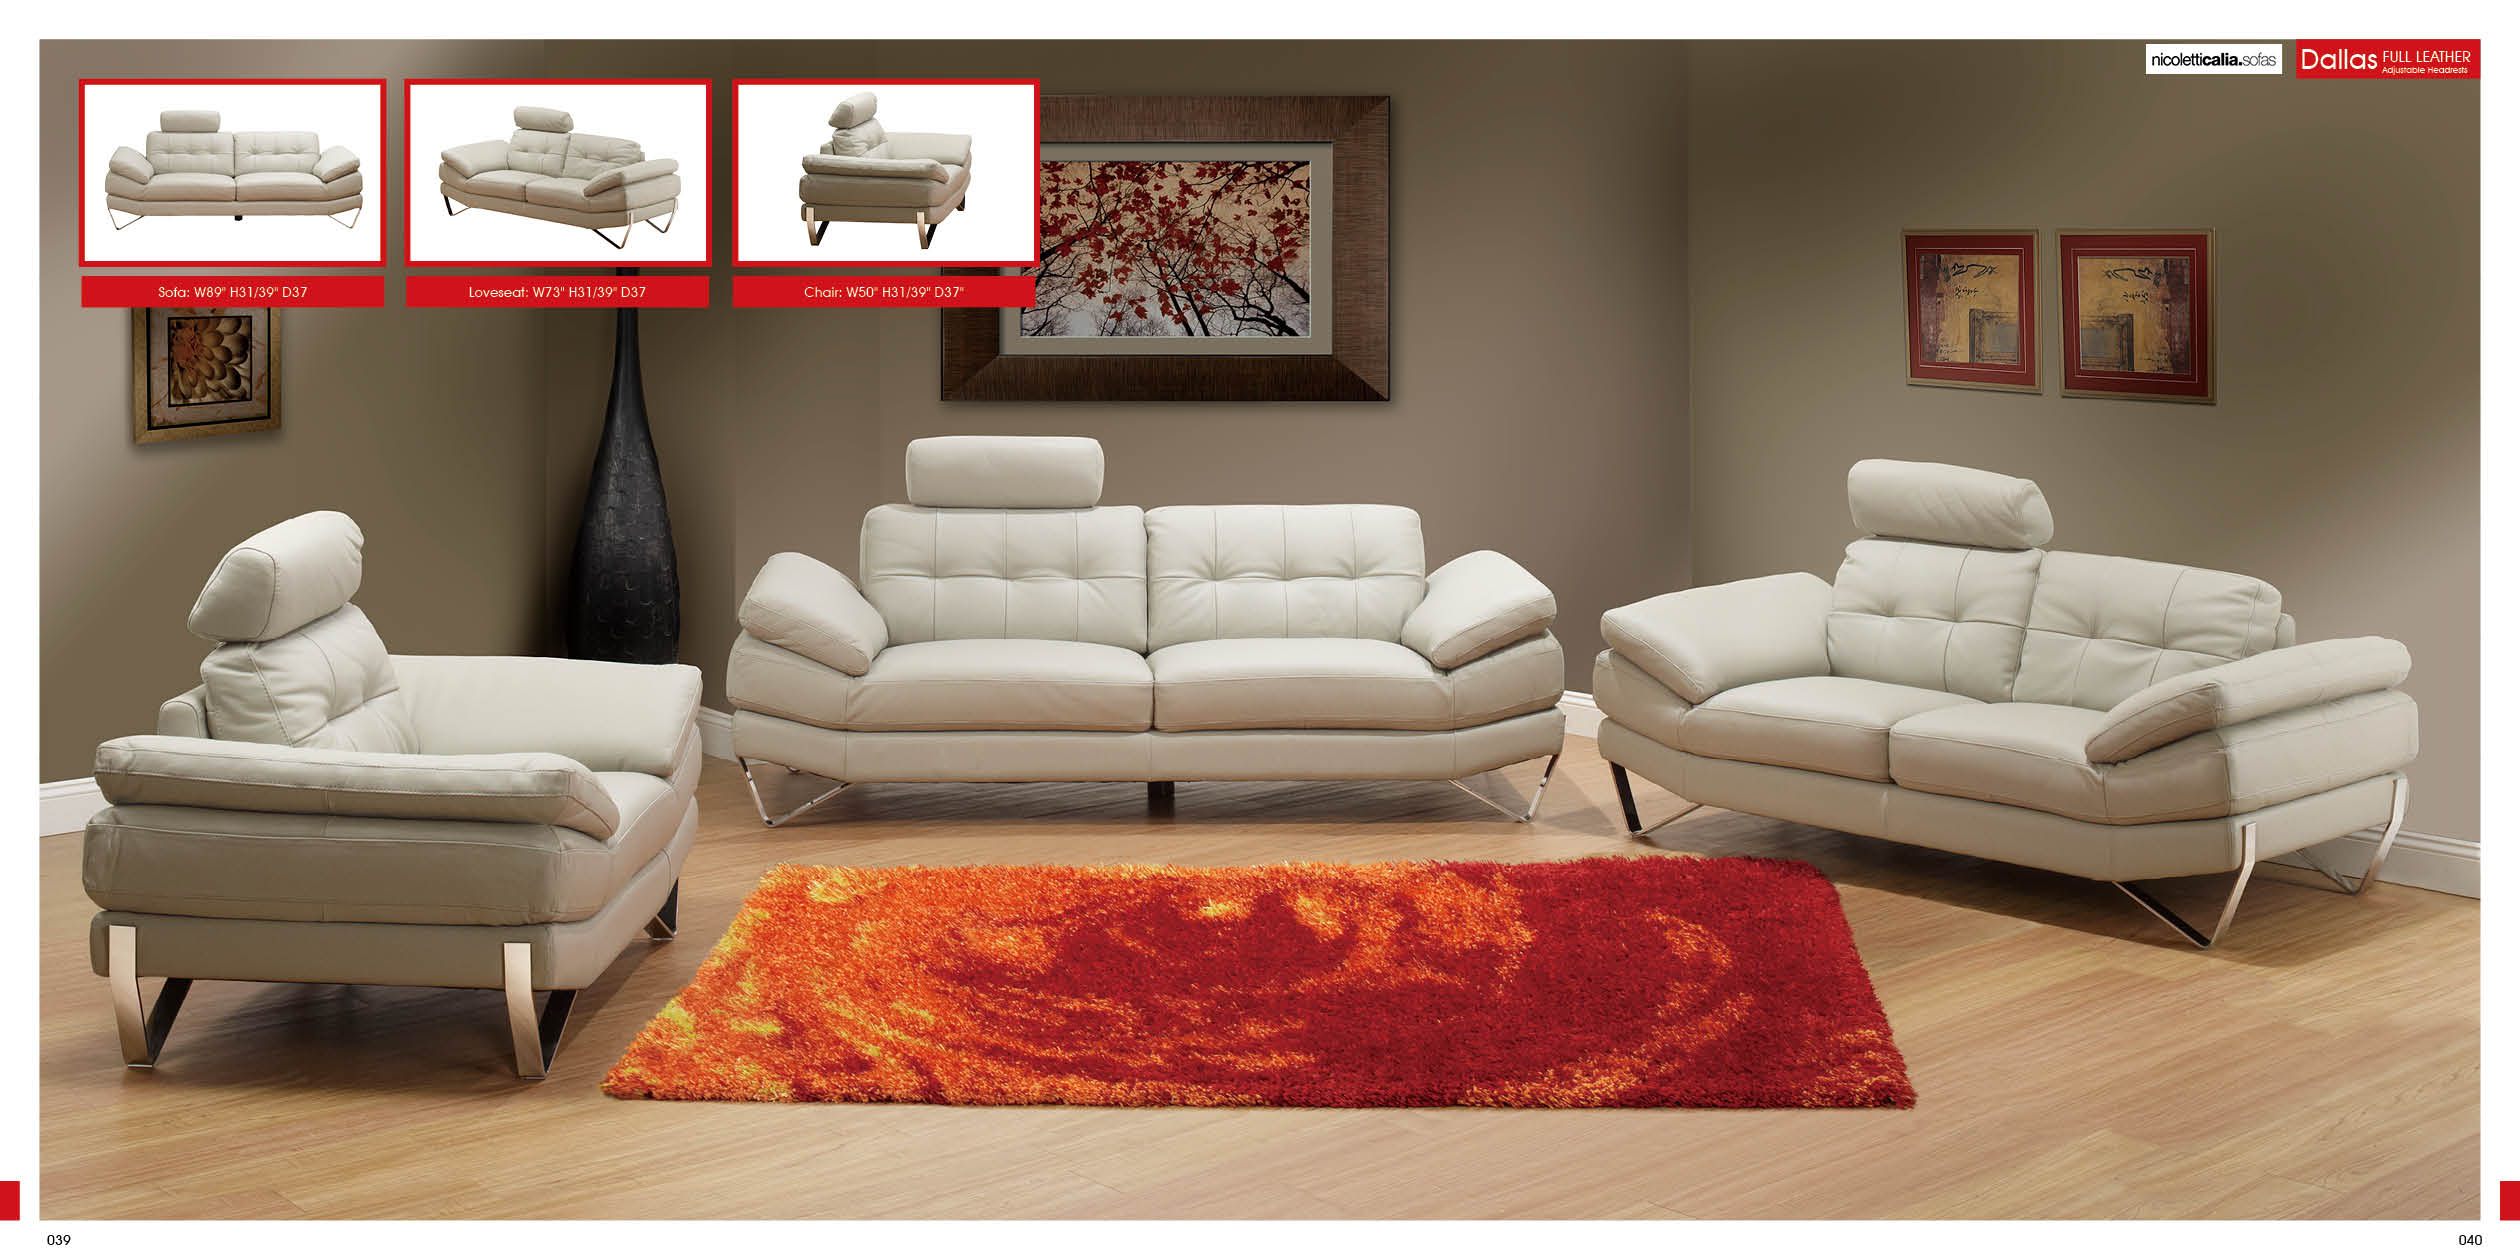 New Products : SA Furniture, San Antonio Furniture of Texas